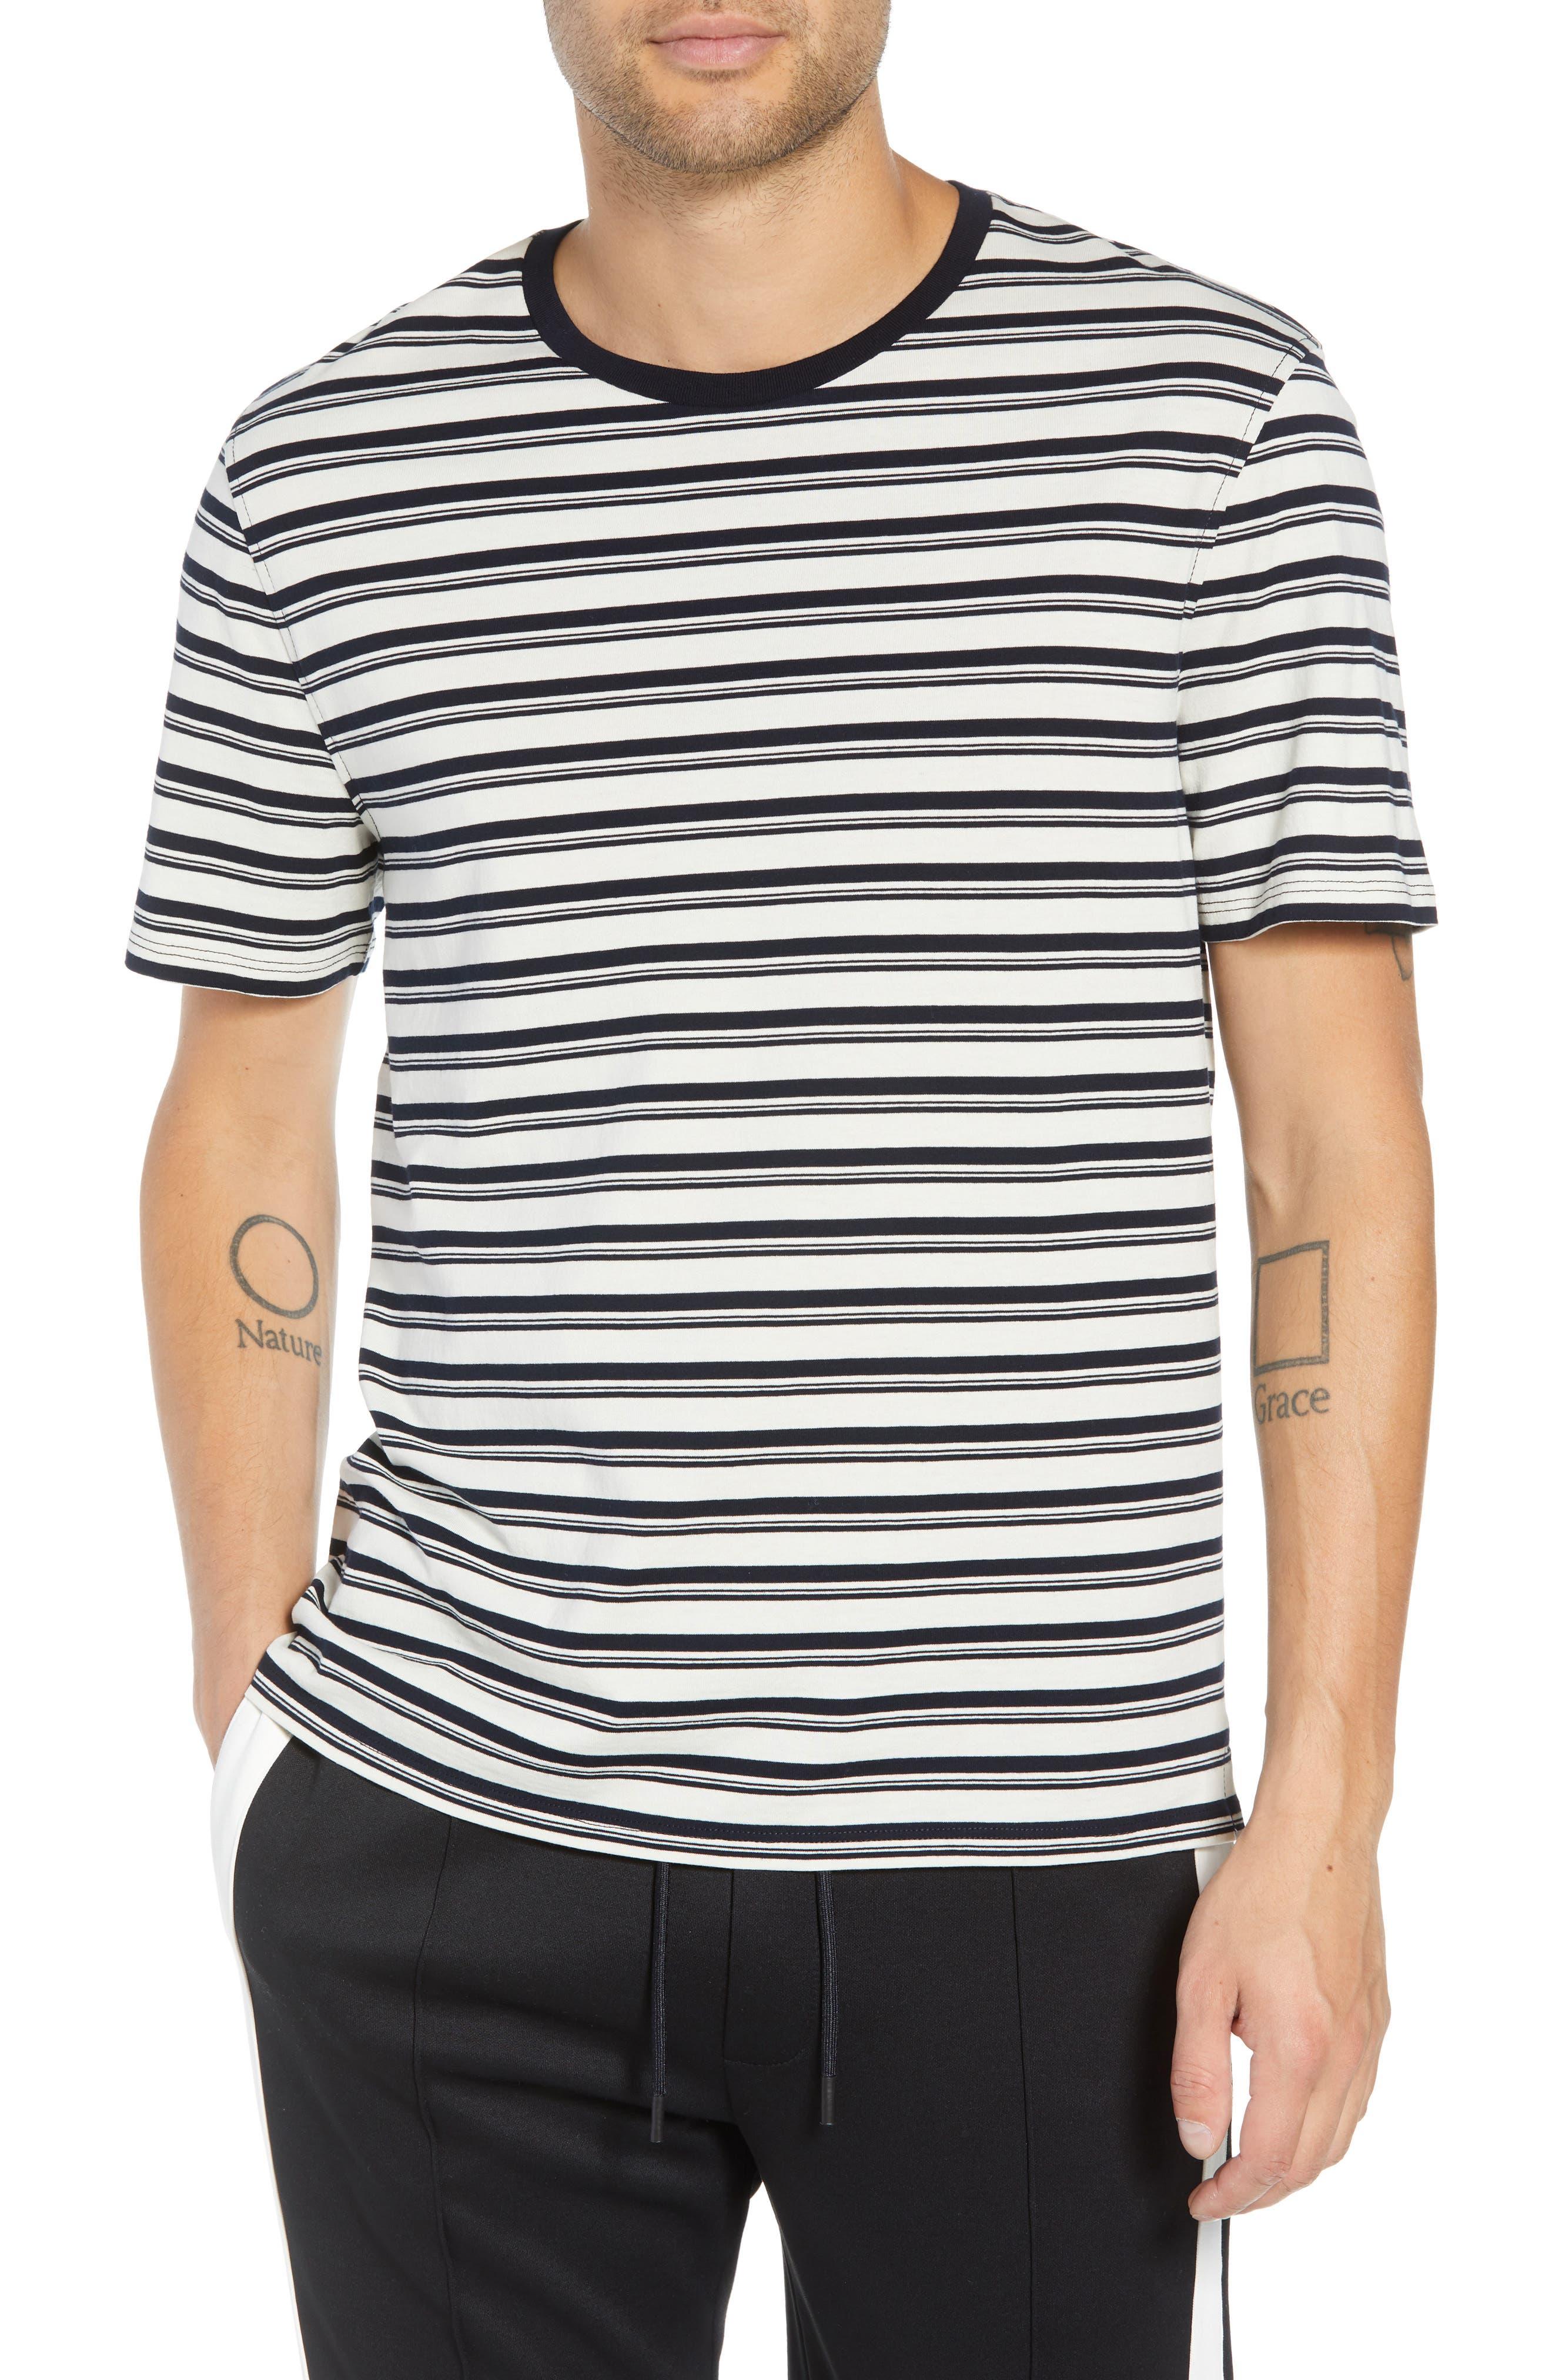 Variegated Stripe Regular Fit Cotton Crewneck T-Shirt,                             Main thumbnail 1, color,                             400